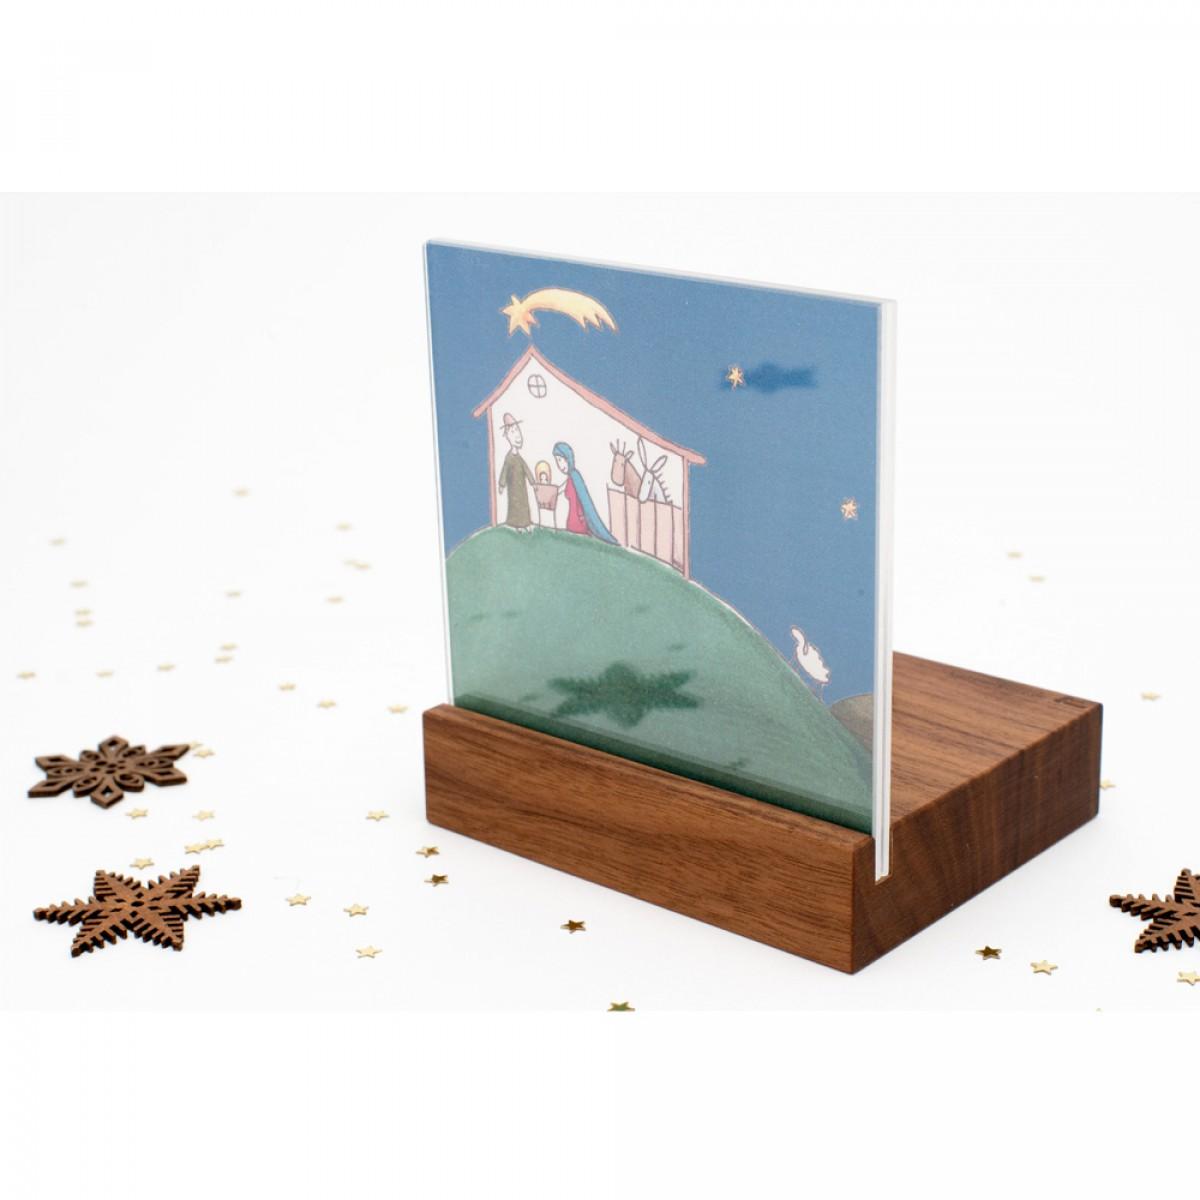 klotzaufklotz Weihnachtskrippe Mini Landschaft (Nussbaum)